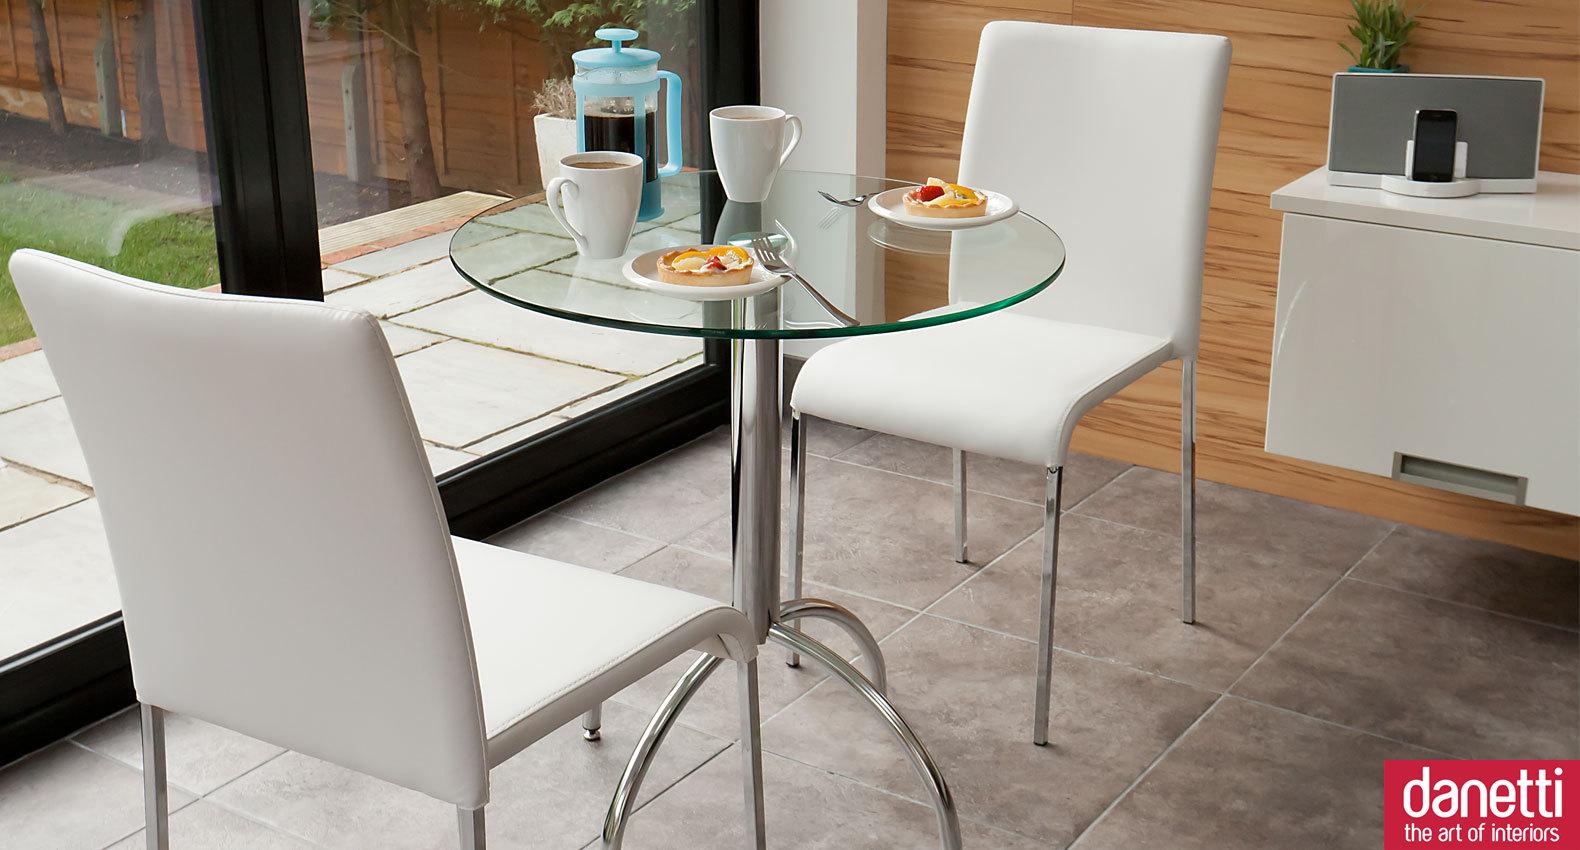 glass kitchen tables drawer organizer interior home design with